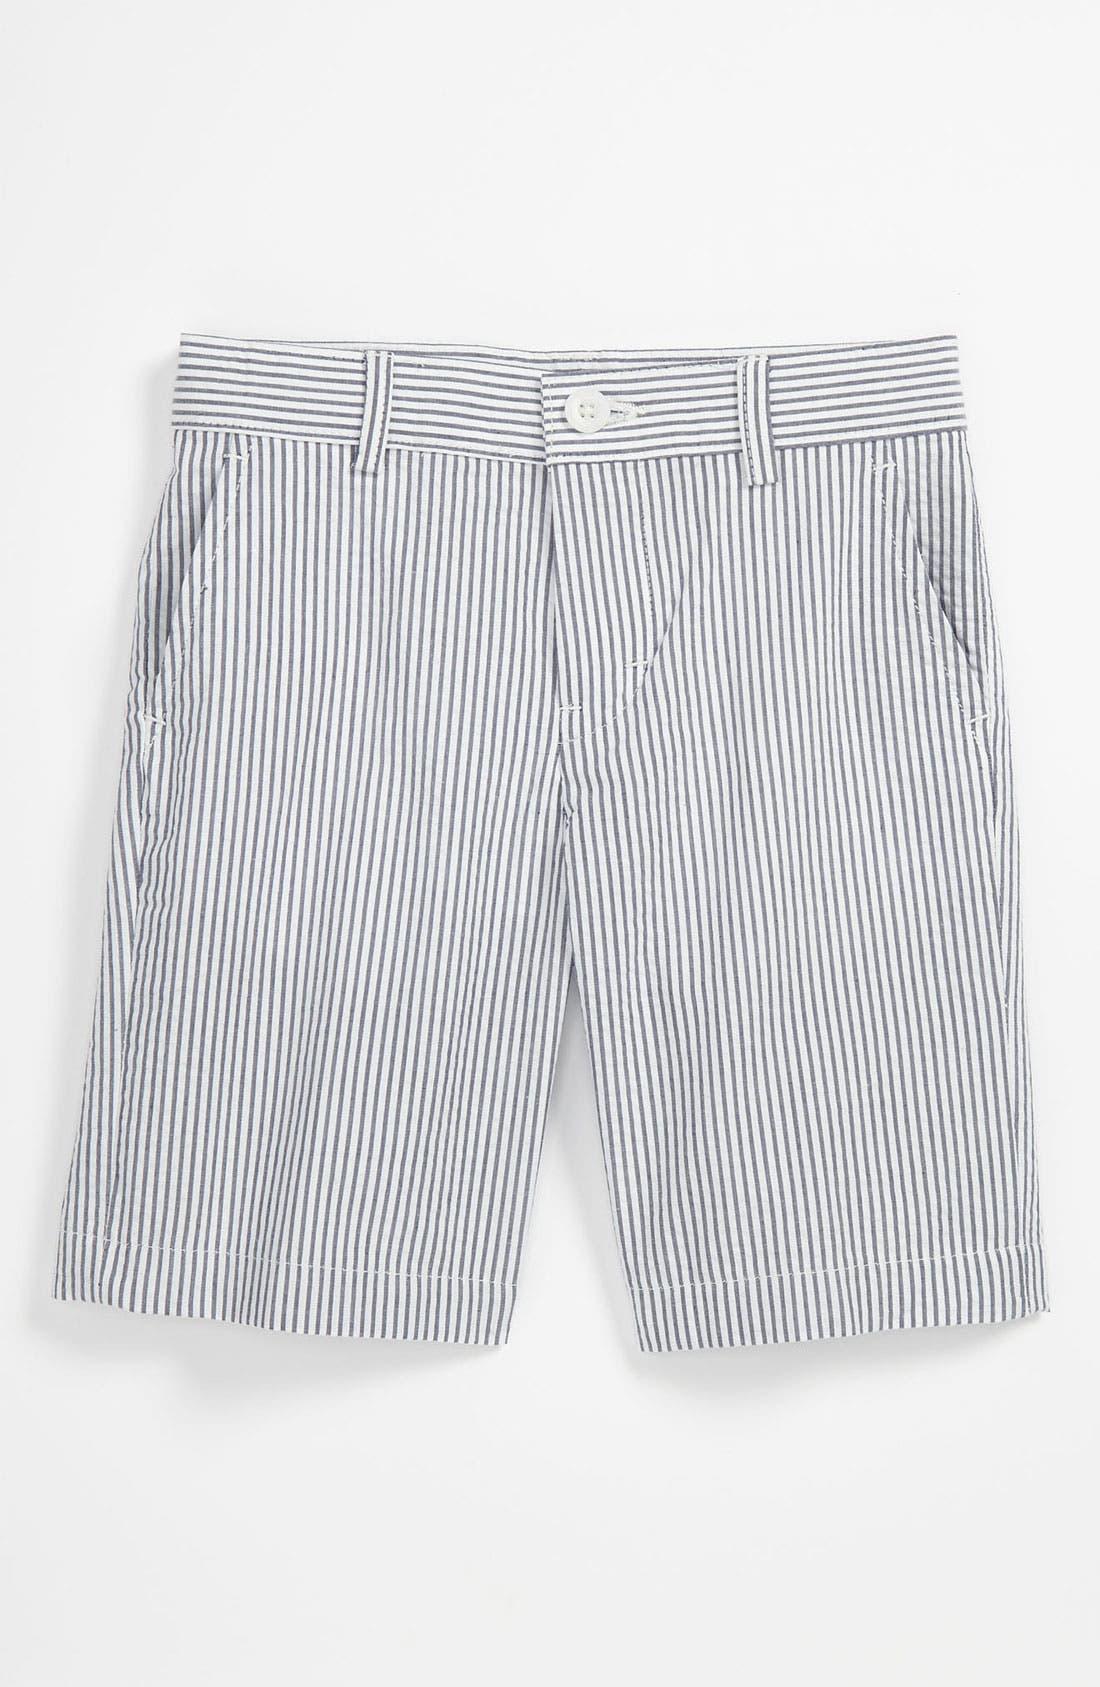 Main Image - Nordstrom 'Timothy' Seersucker Shorts (Toddler)